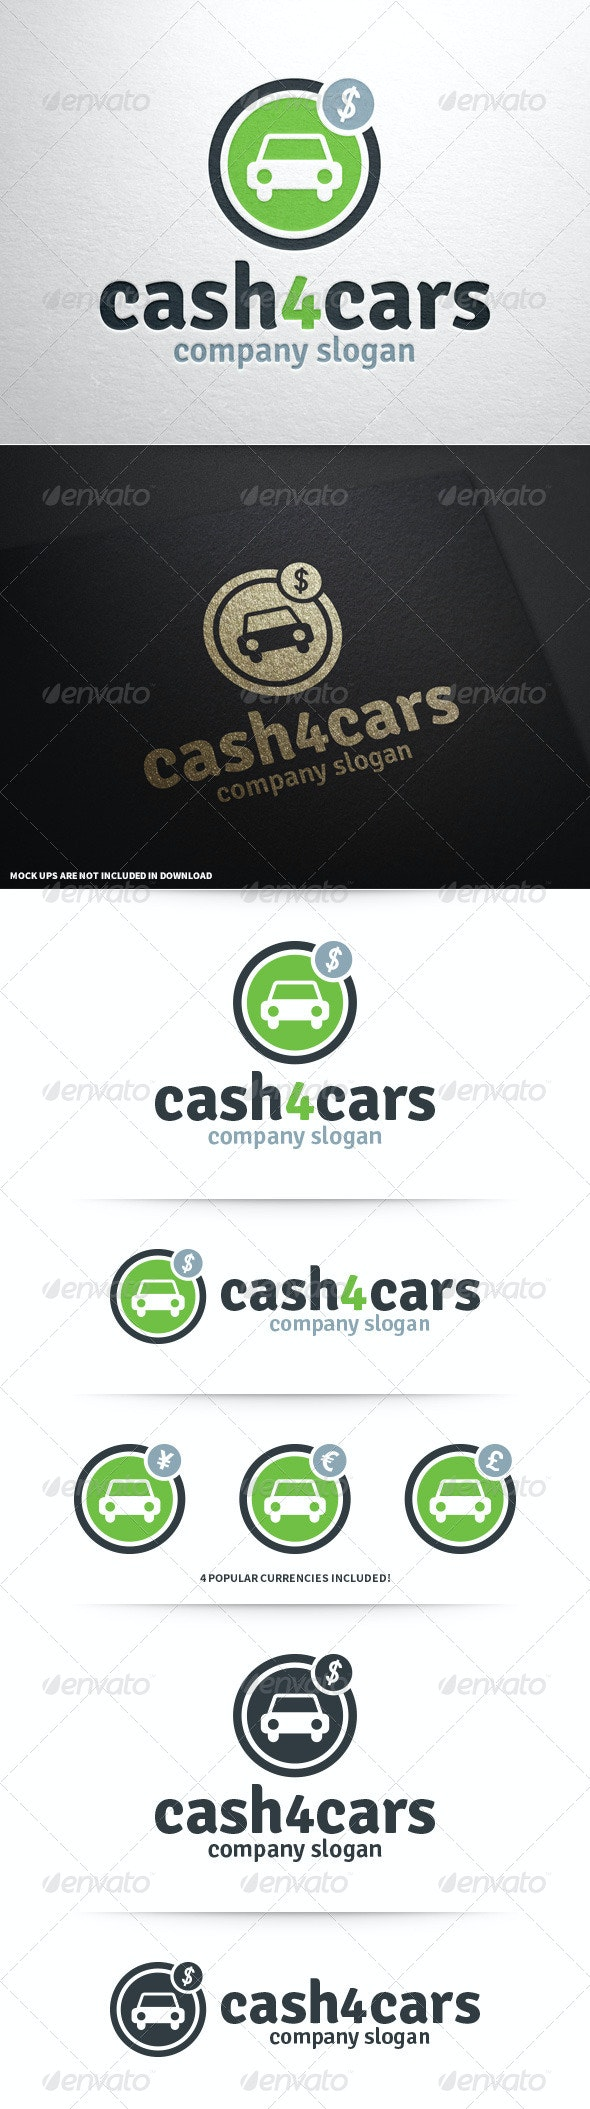 Cash 4 Cars Logo Template - Symbols Logo Templates